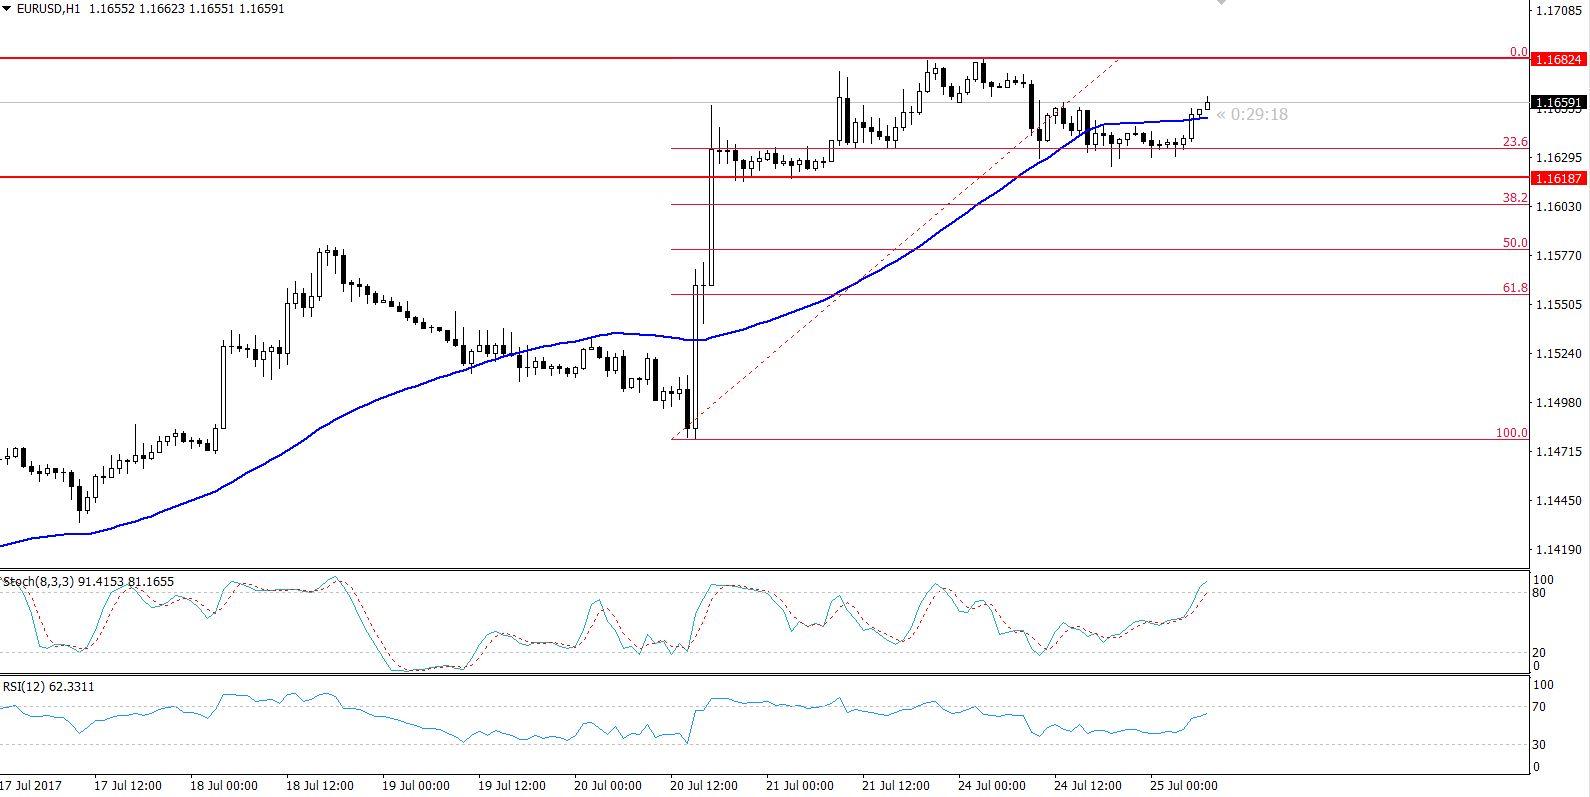 EUR/USD - Sideways Channel - Hourly Chart